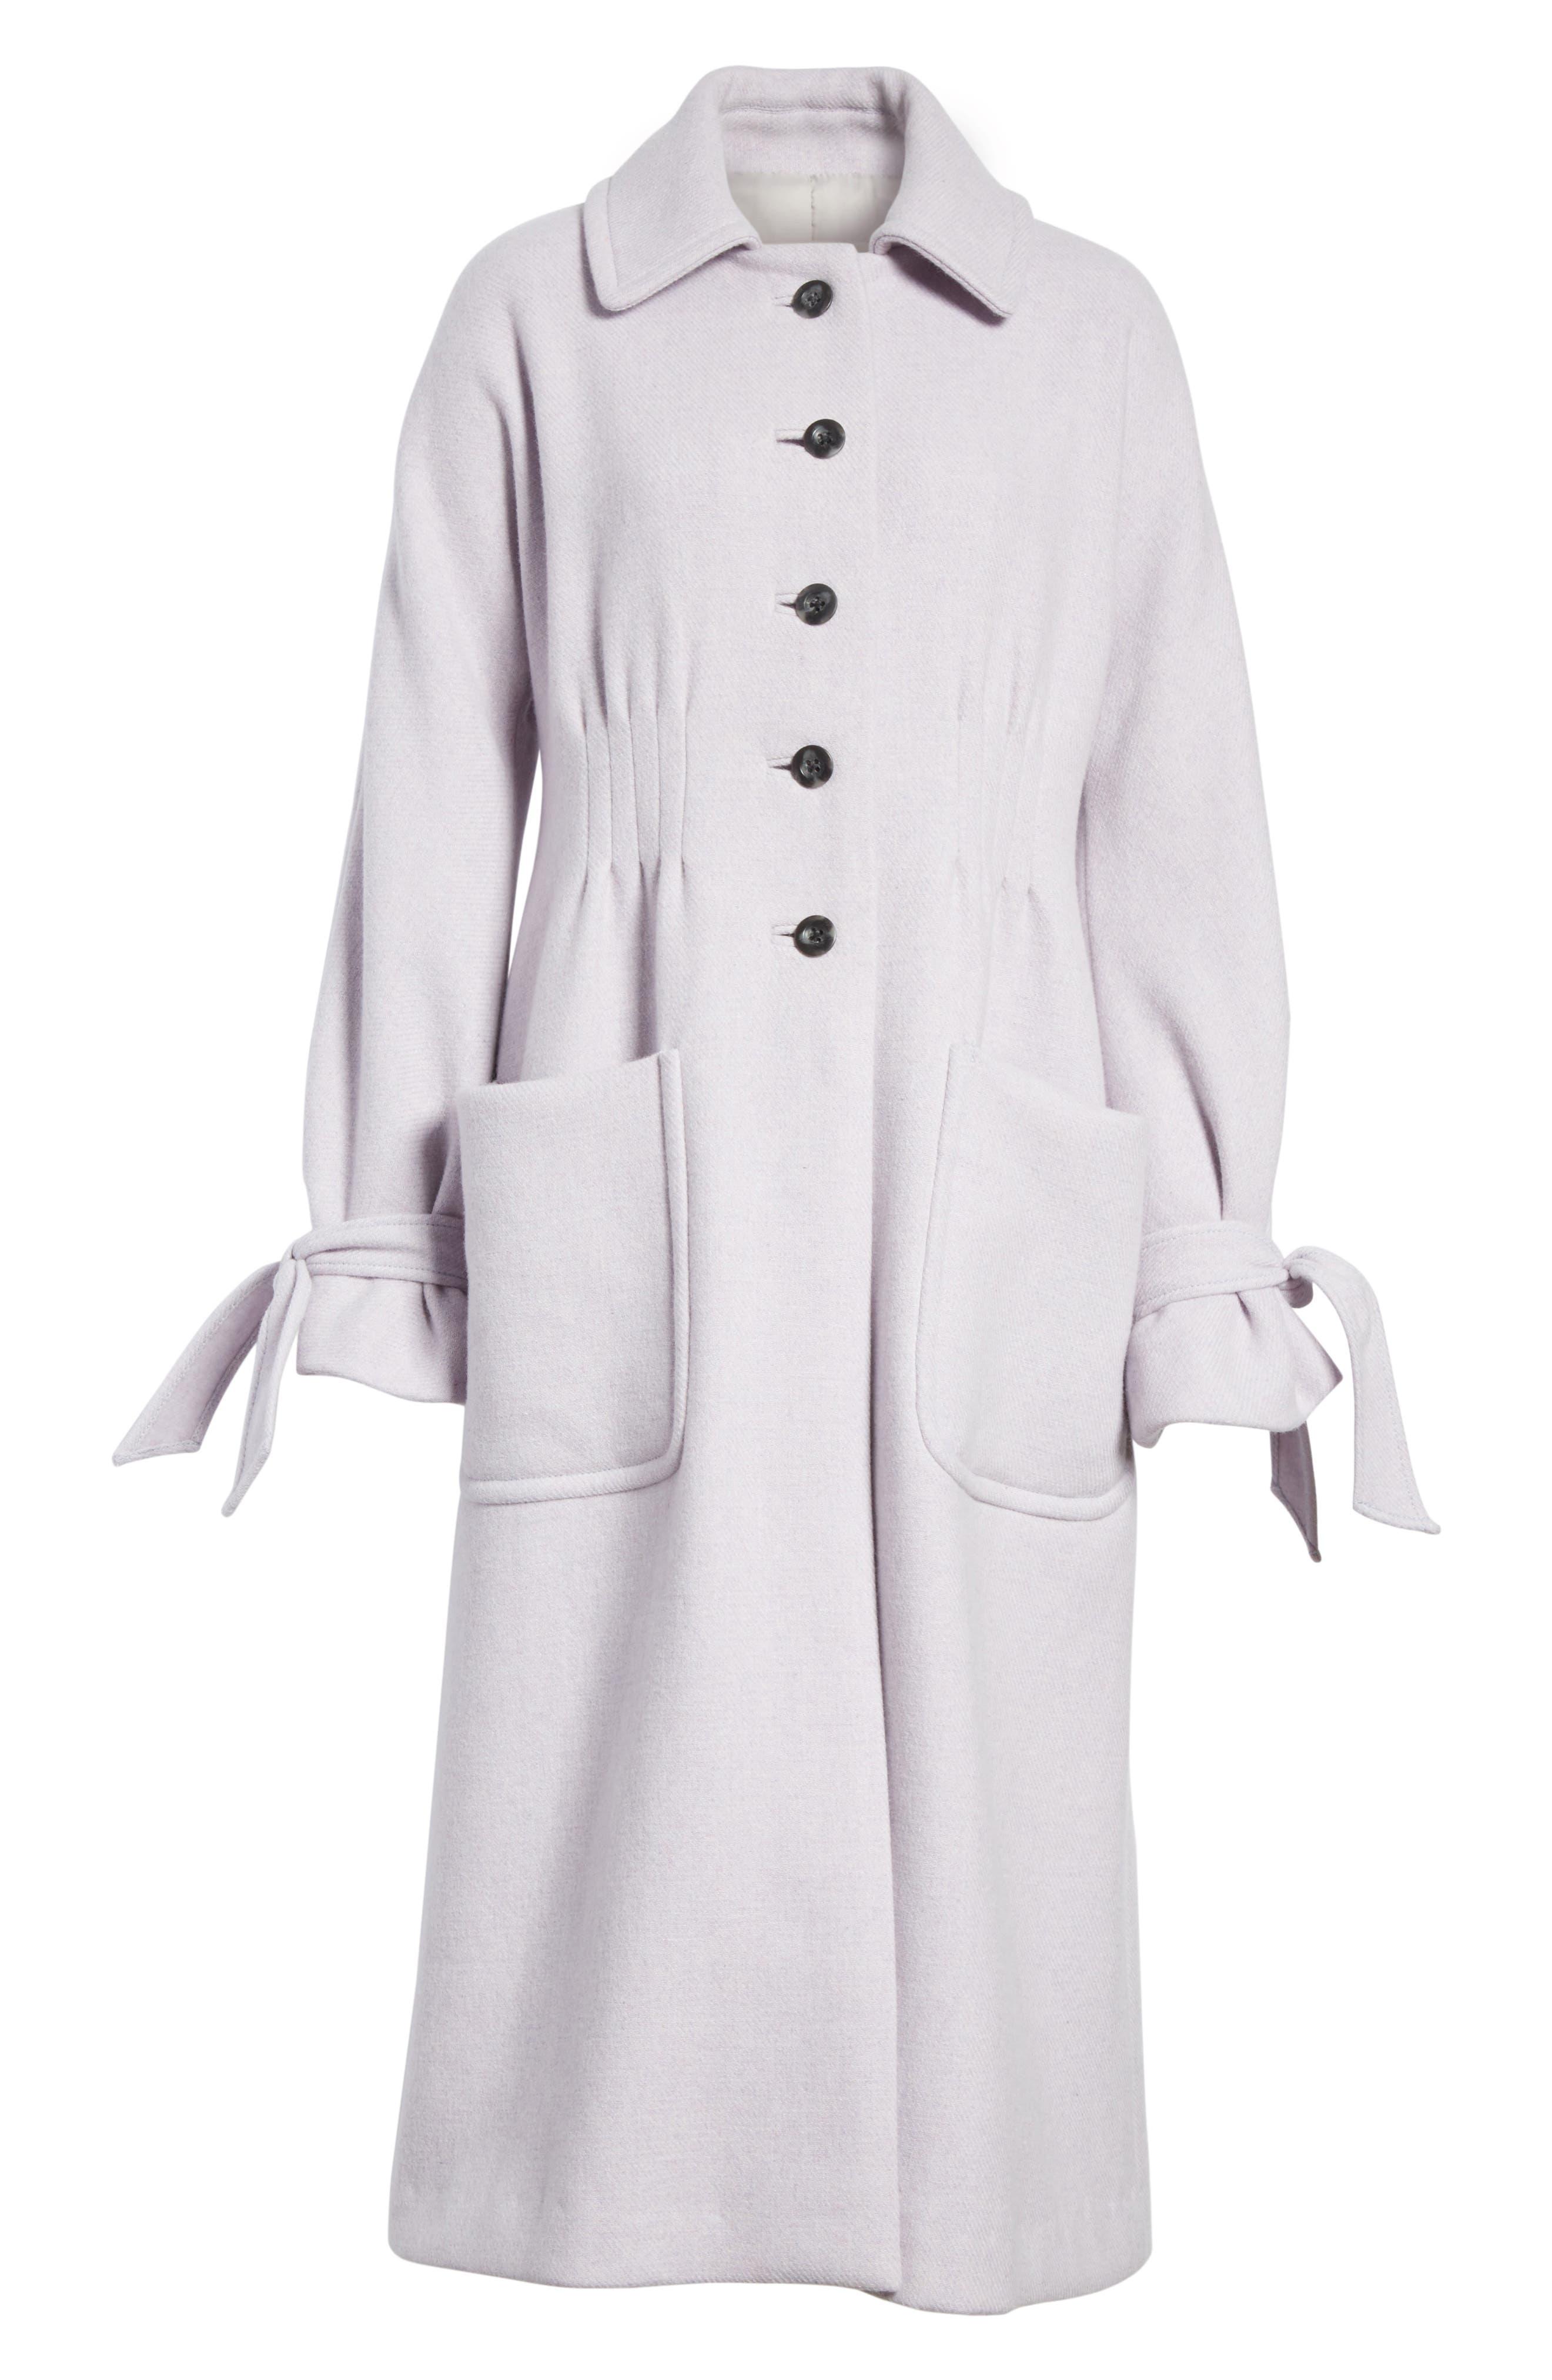 Wool Blend Melton Coat,                             Alternate thumbnail 5, color,                             538